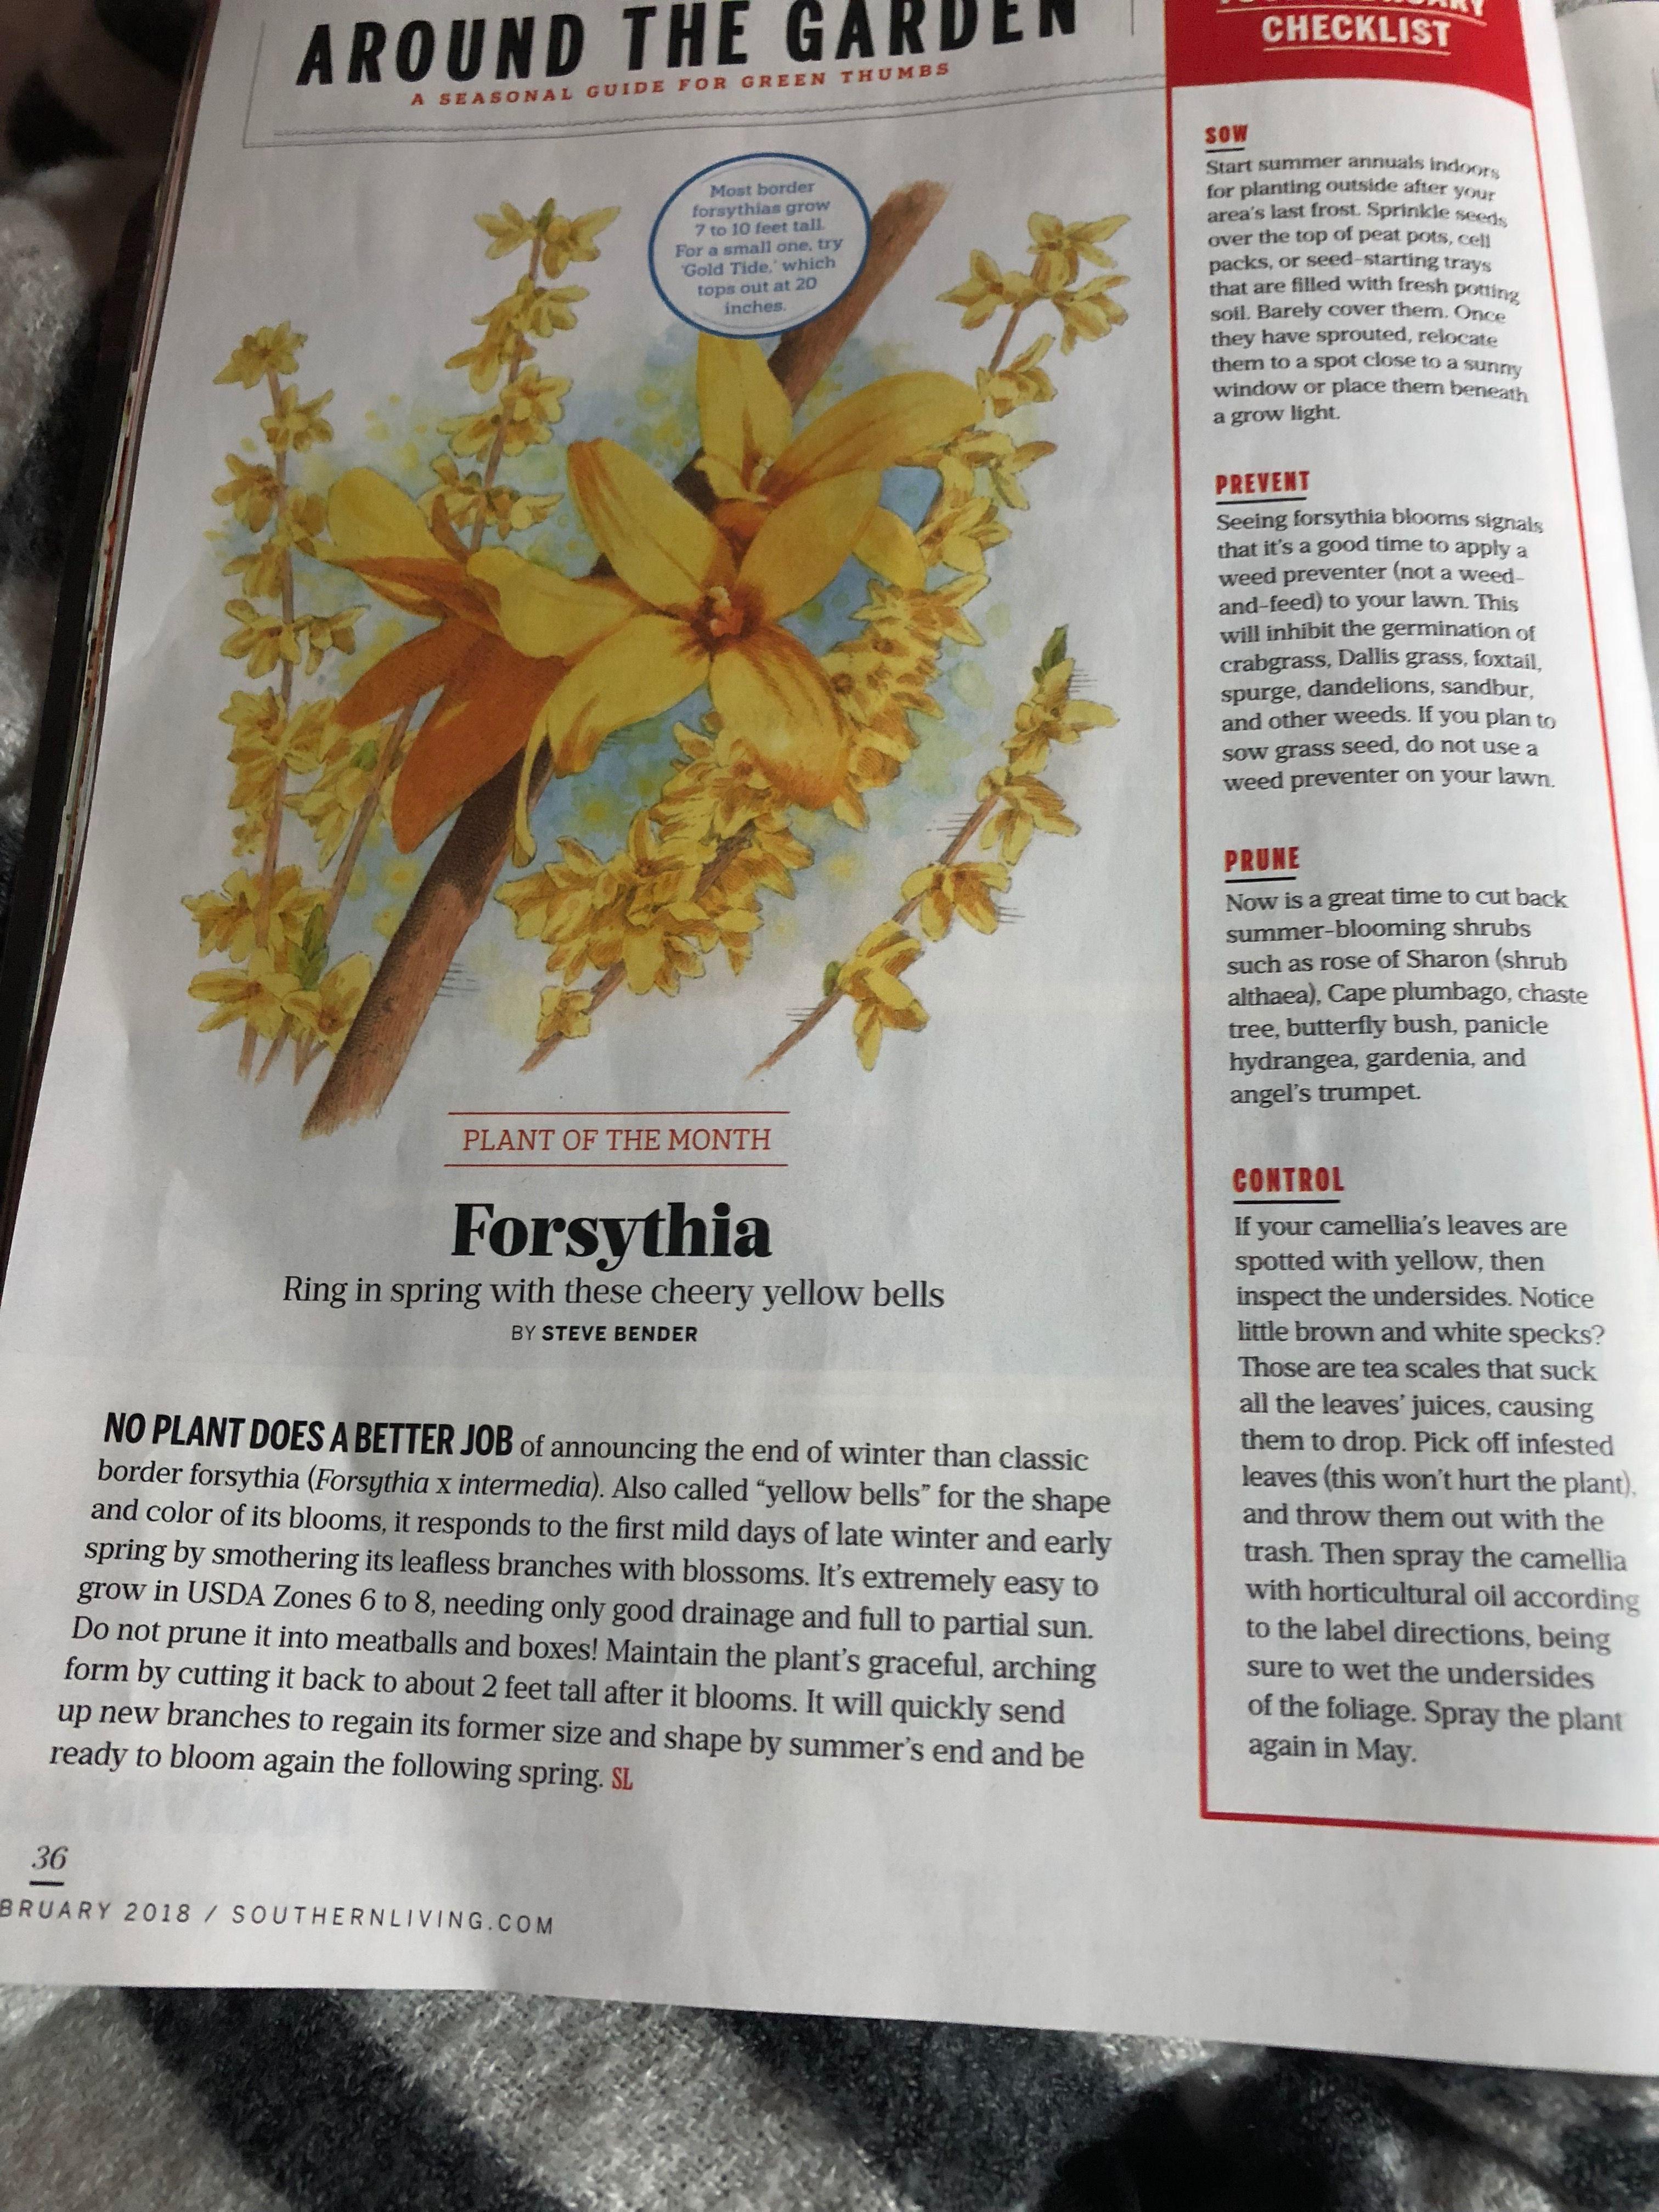 Pin By Michelle Todd On House Garden Landscape Bench Shed Gates Panicle Hydrangea Garden Checklist Angel Trumpet